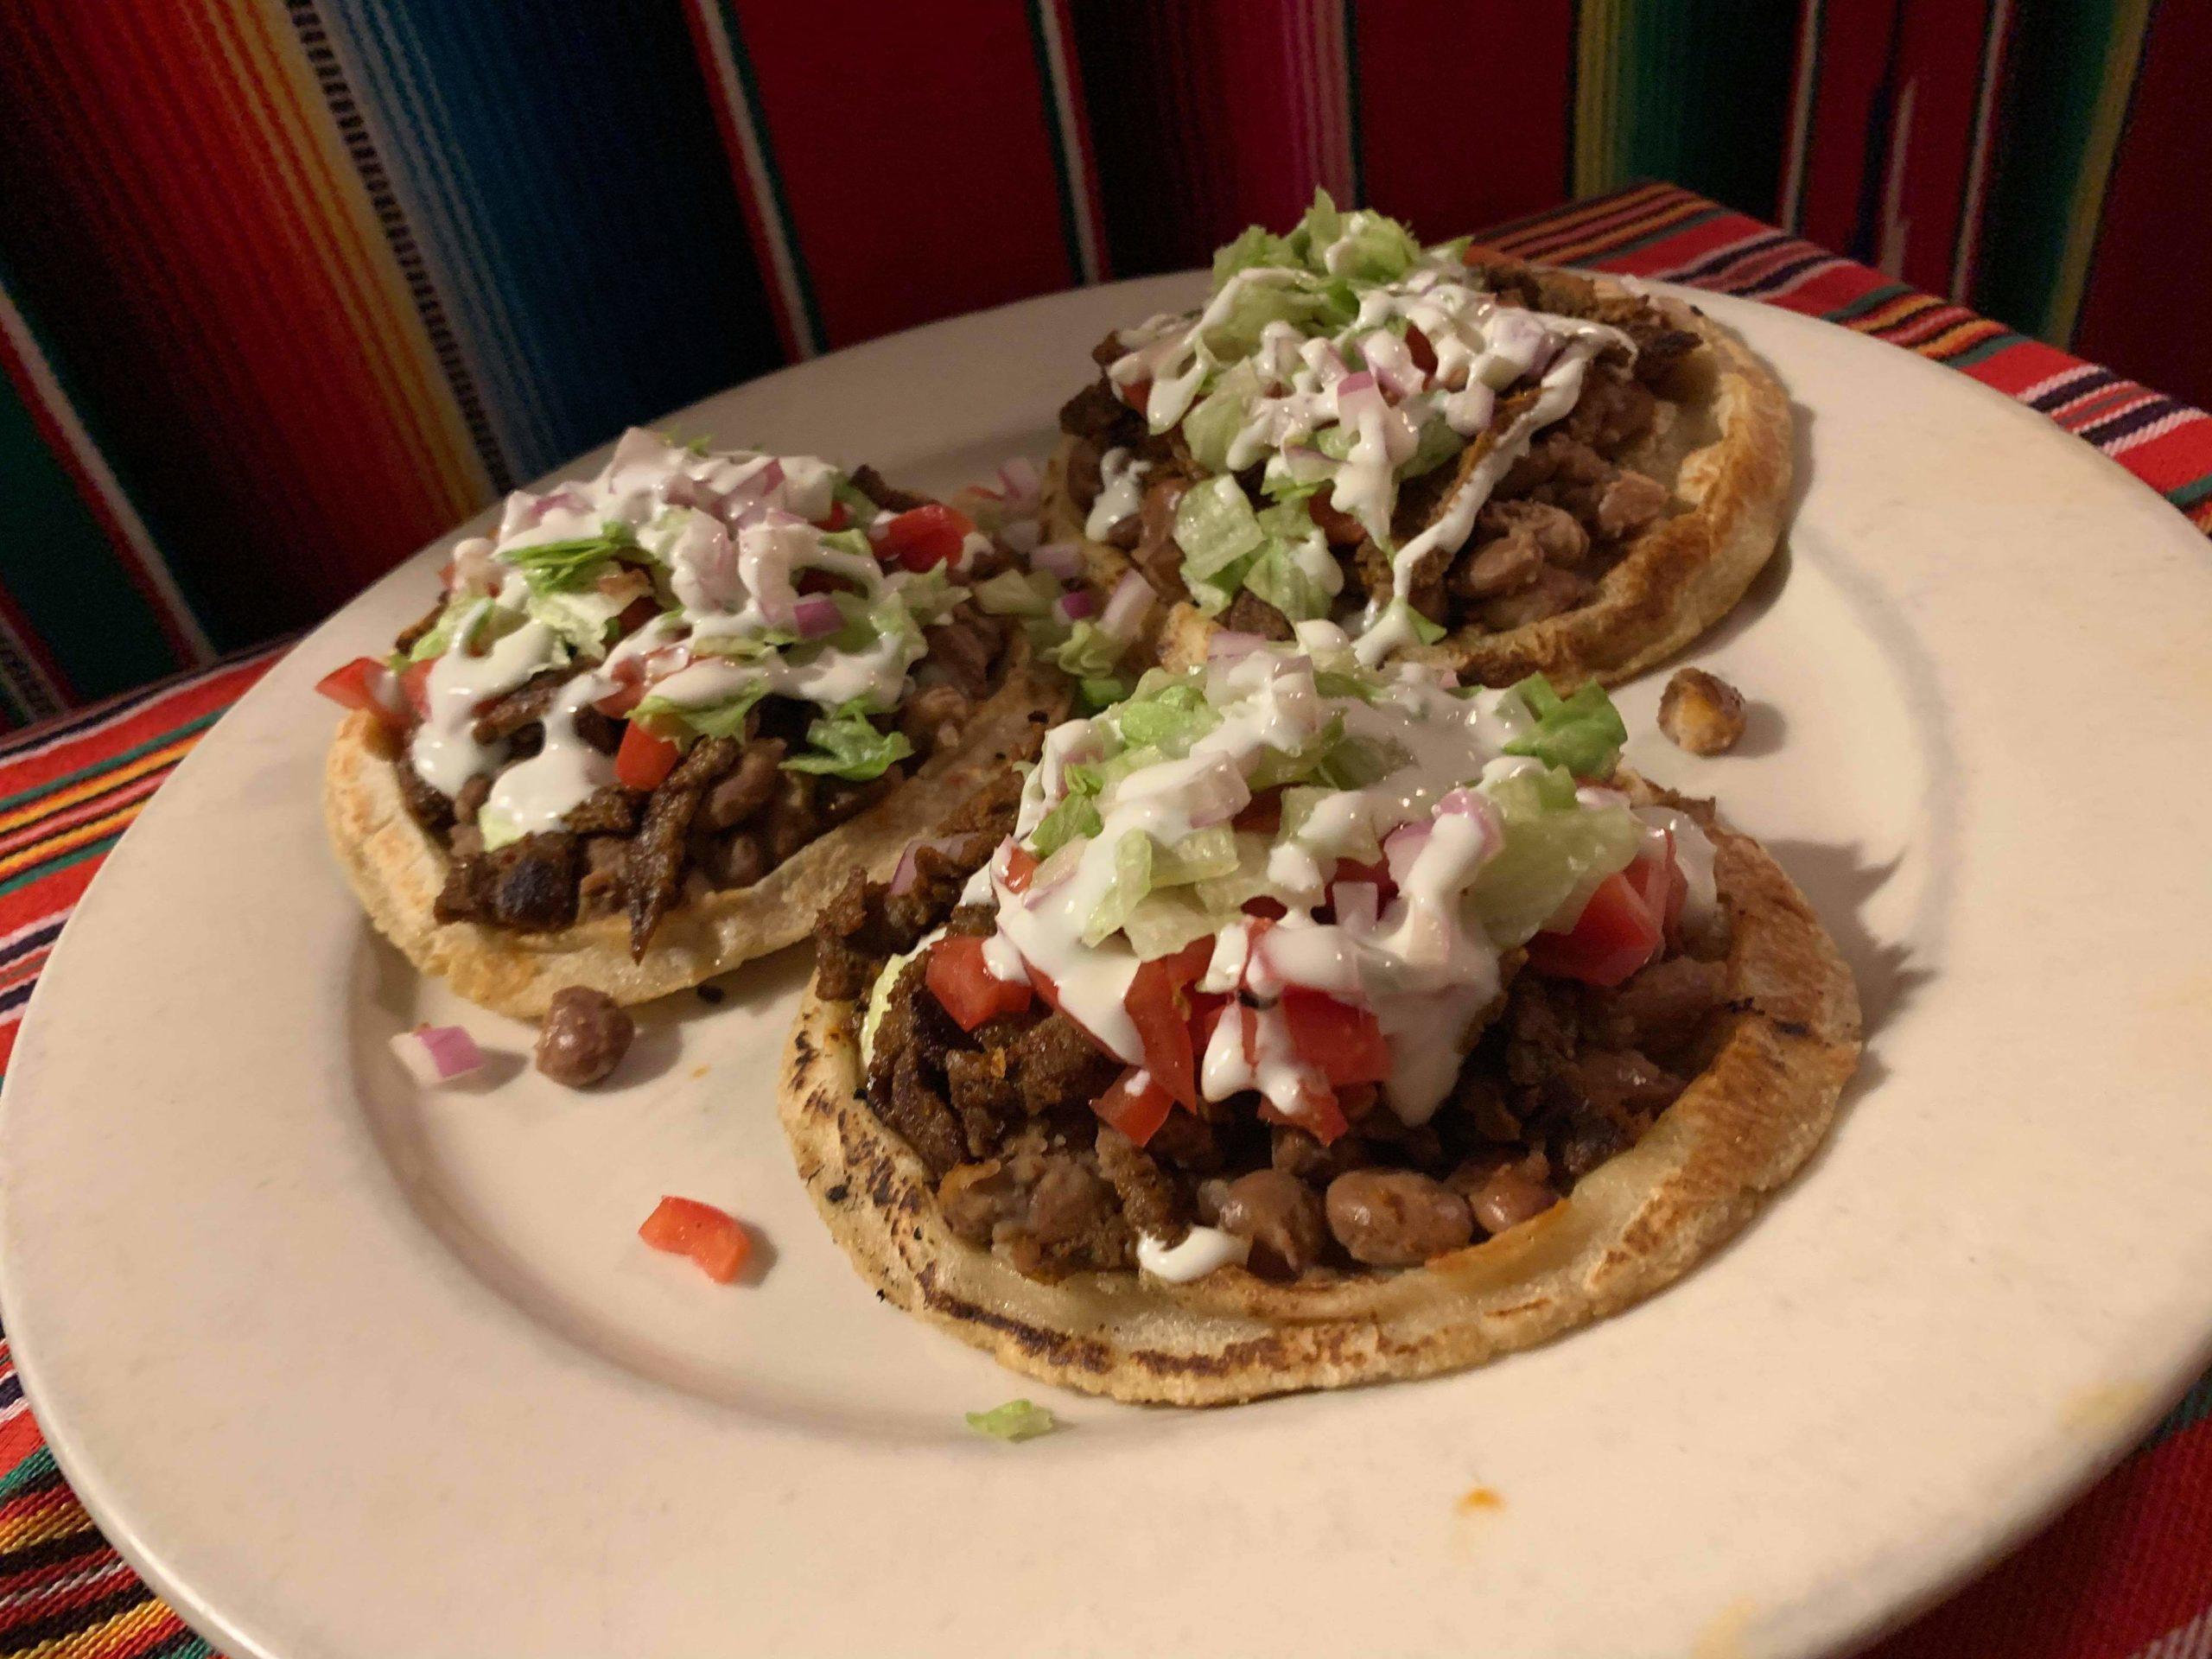 Tex Mex Food in NJ